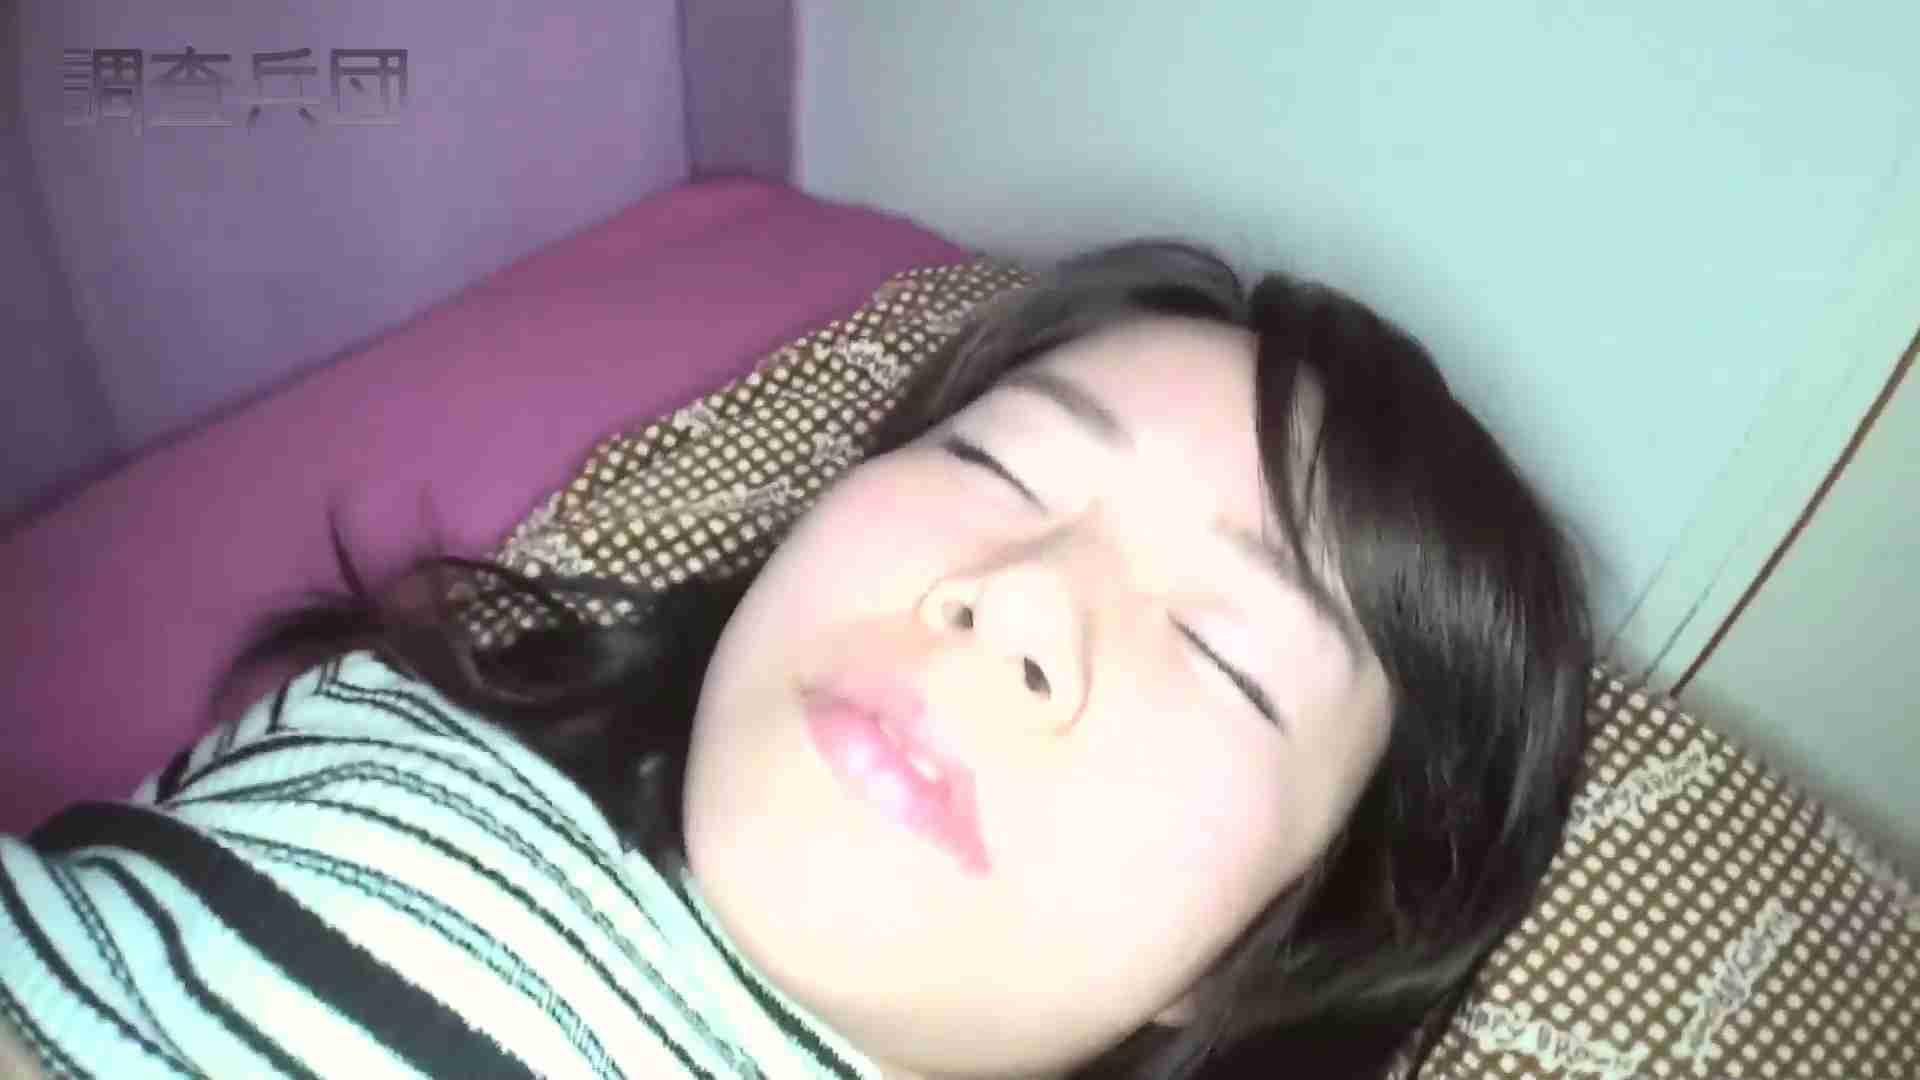 RE:~反撃の悪戯~vol.9 帰国子女の才女・みほ【前編】 OL女体  40連発 40